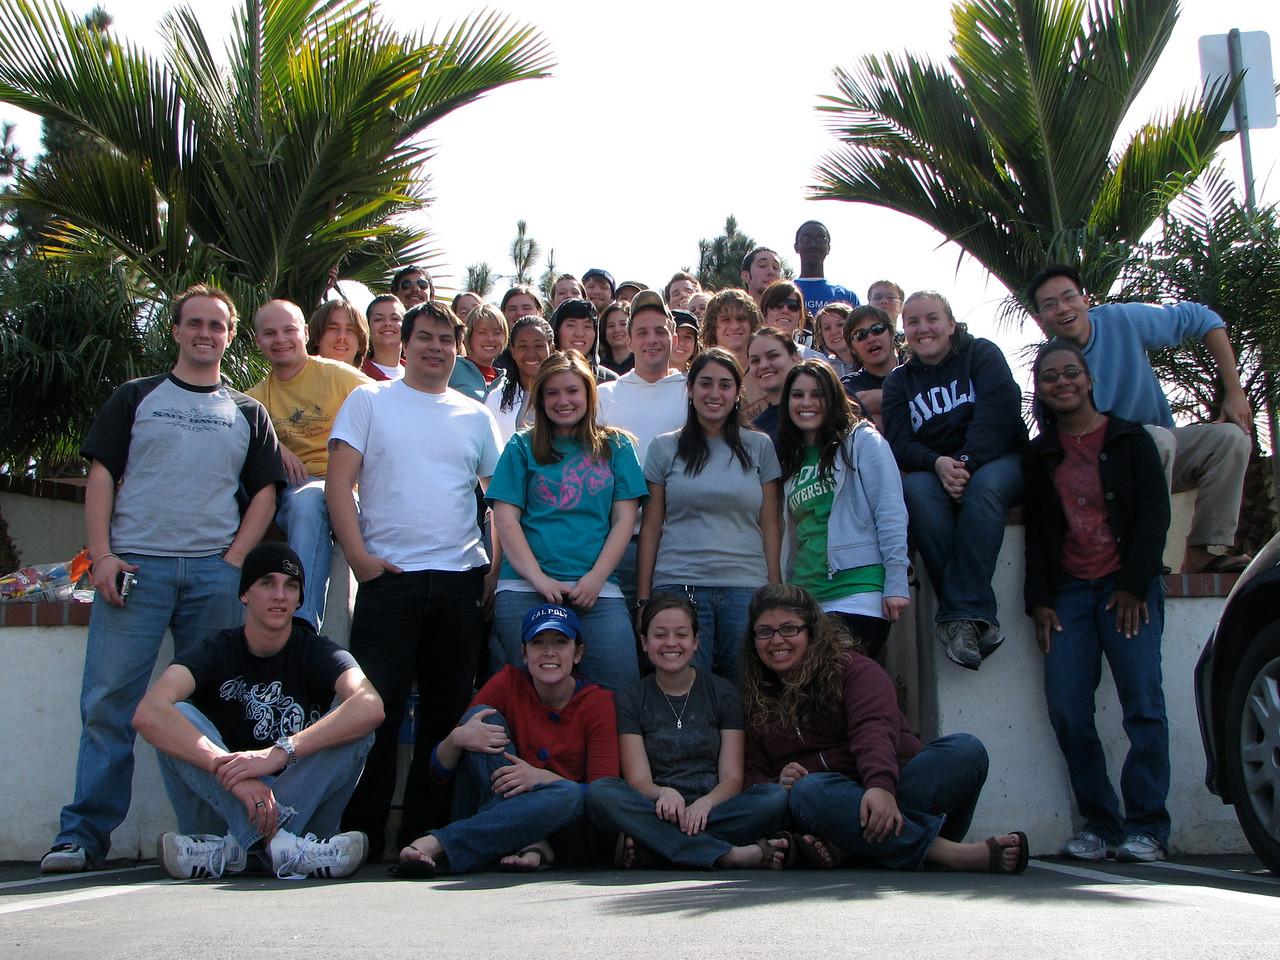 2007 03 03 Sat - Group pic 2